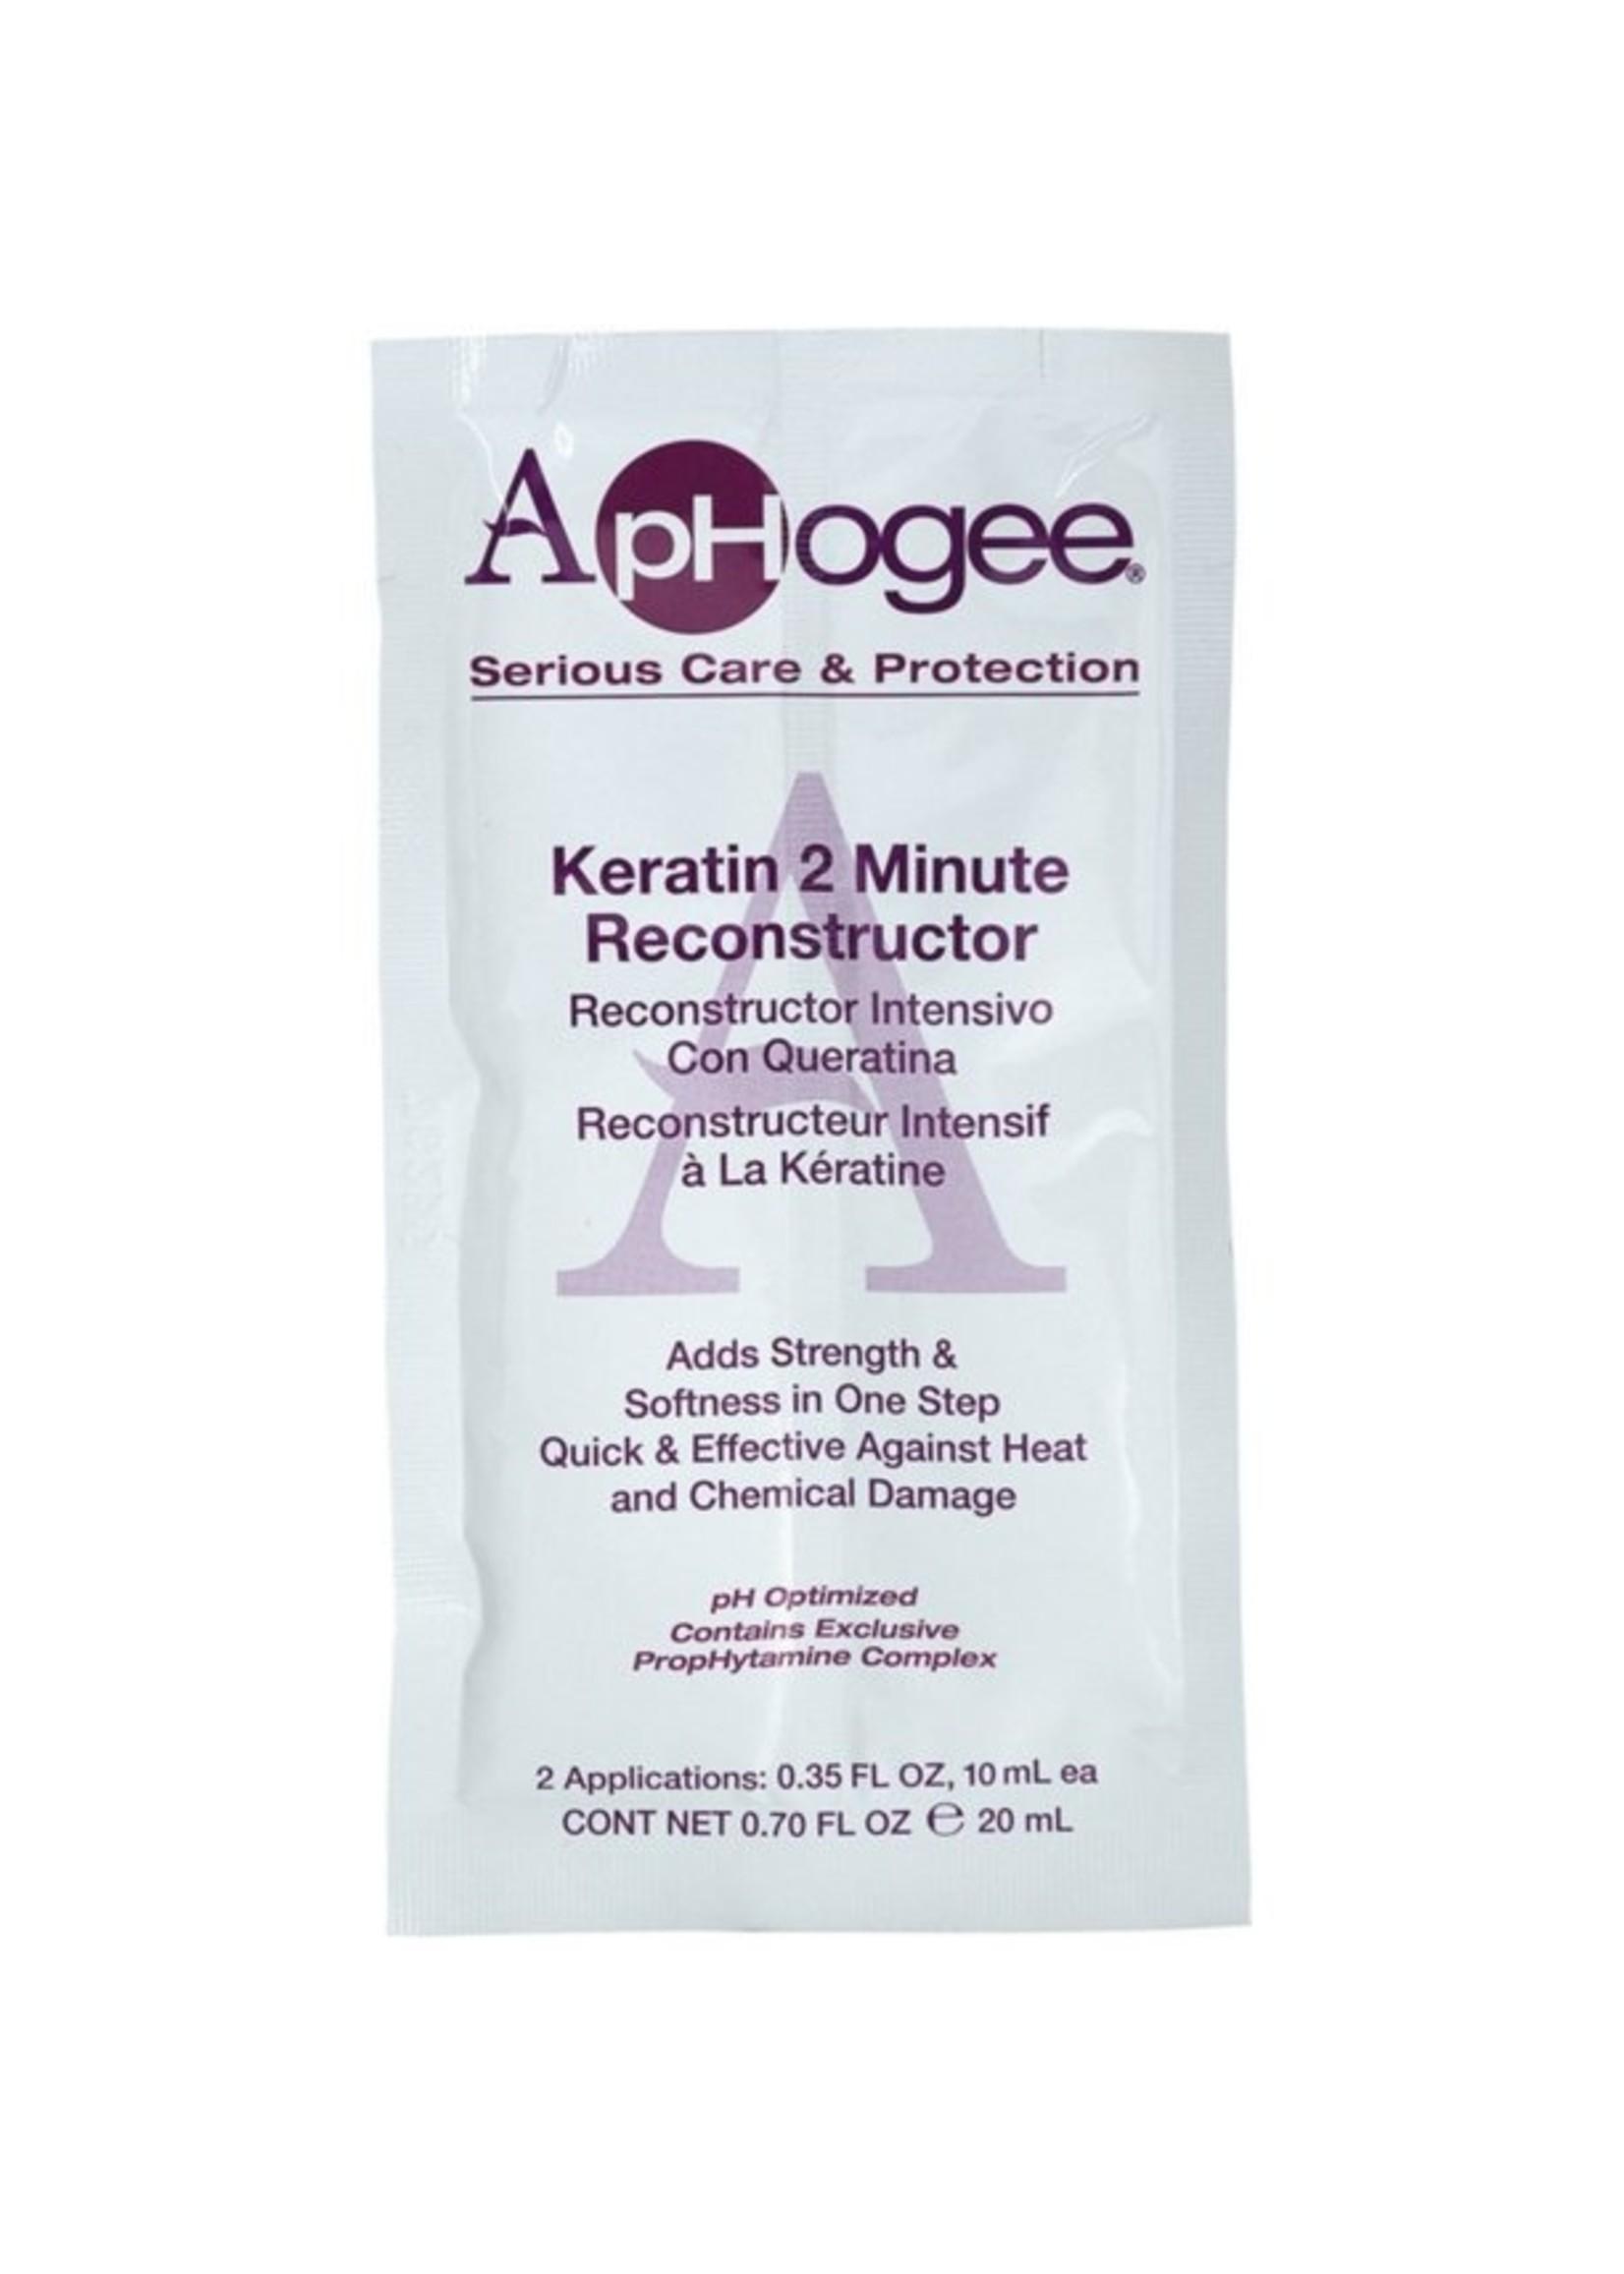 Aphogee Keratin Reconstructor Pack